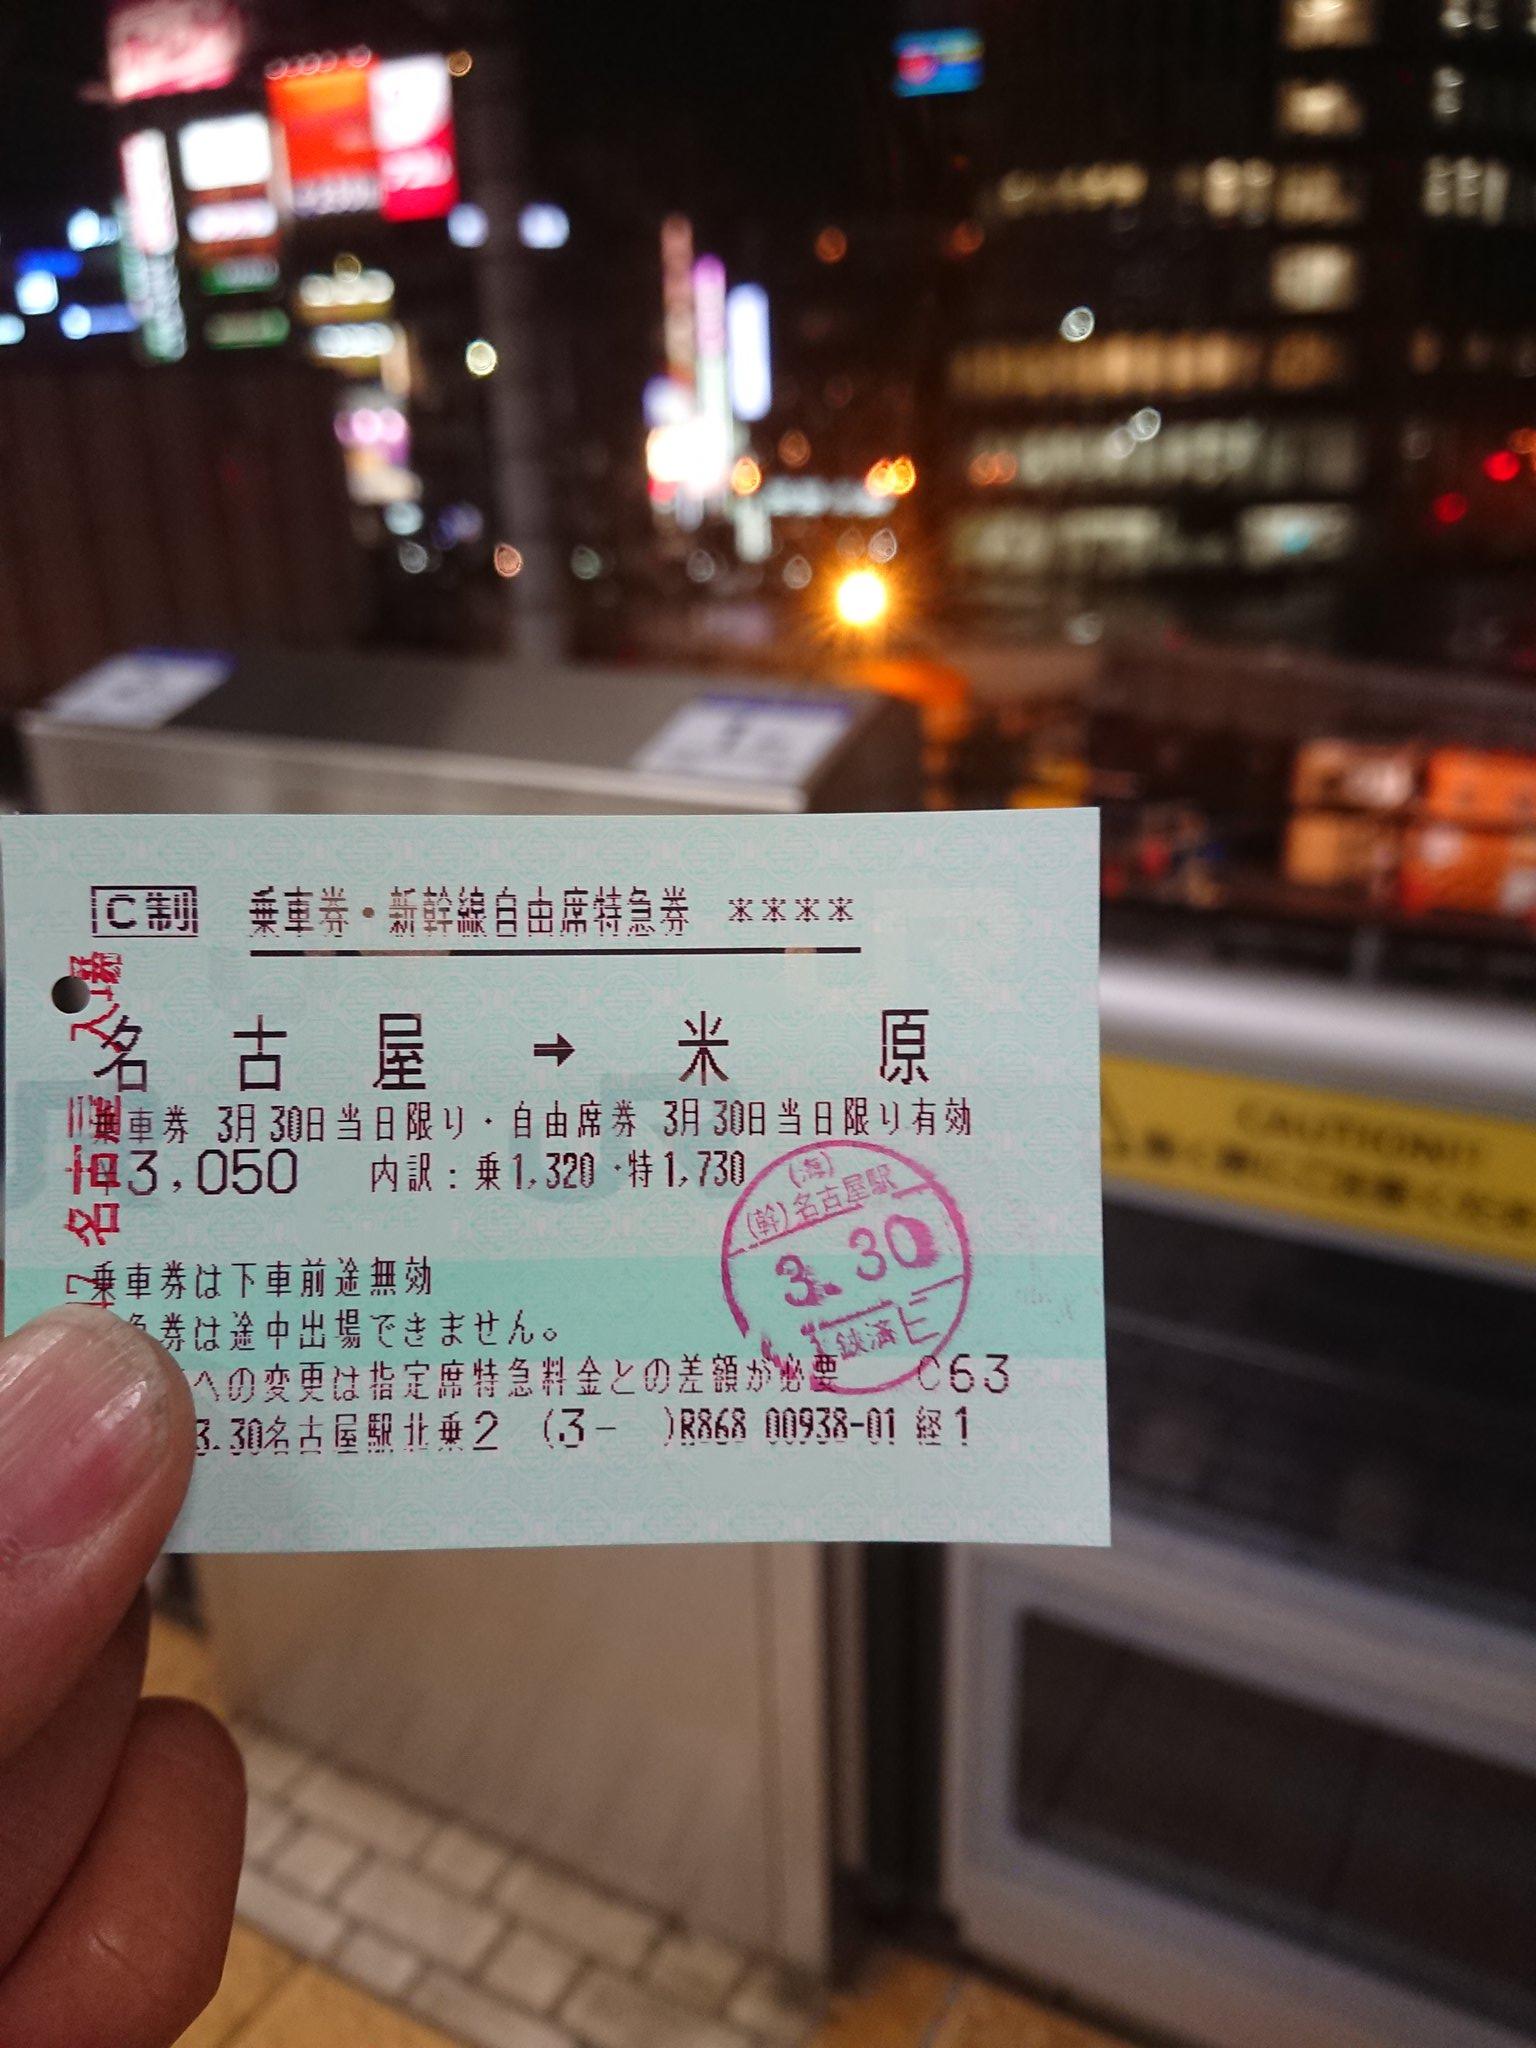 駅 名古屋 米原 駅 から